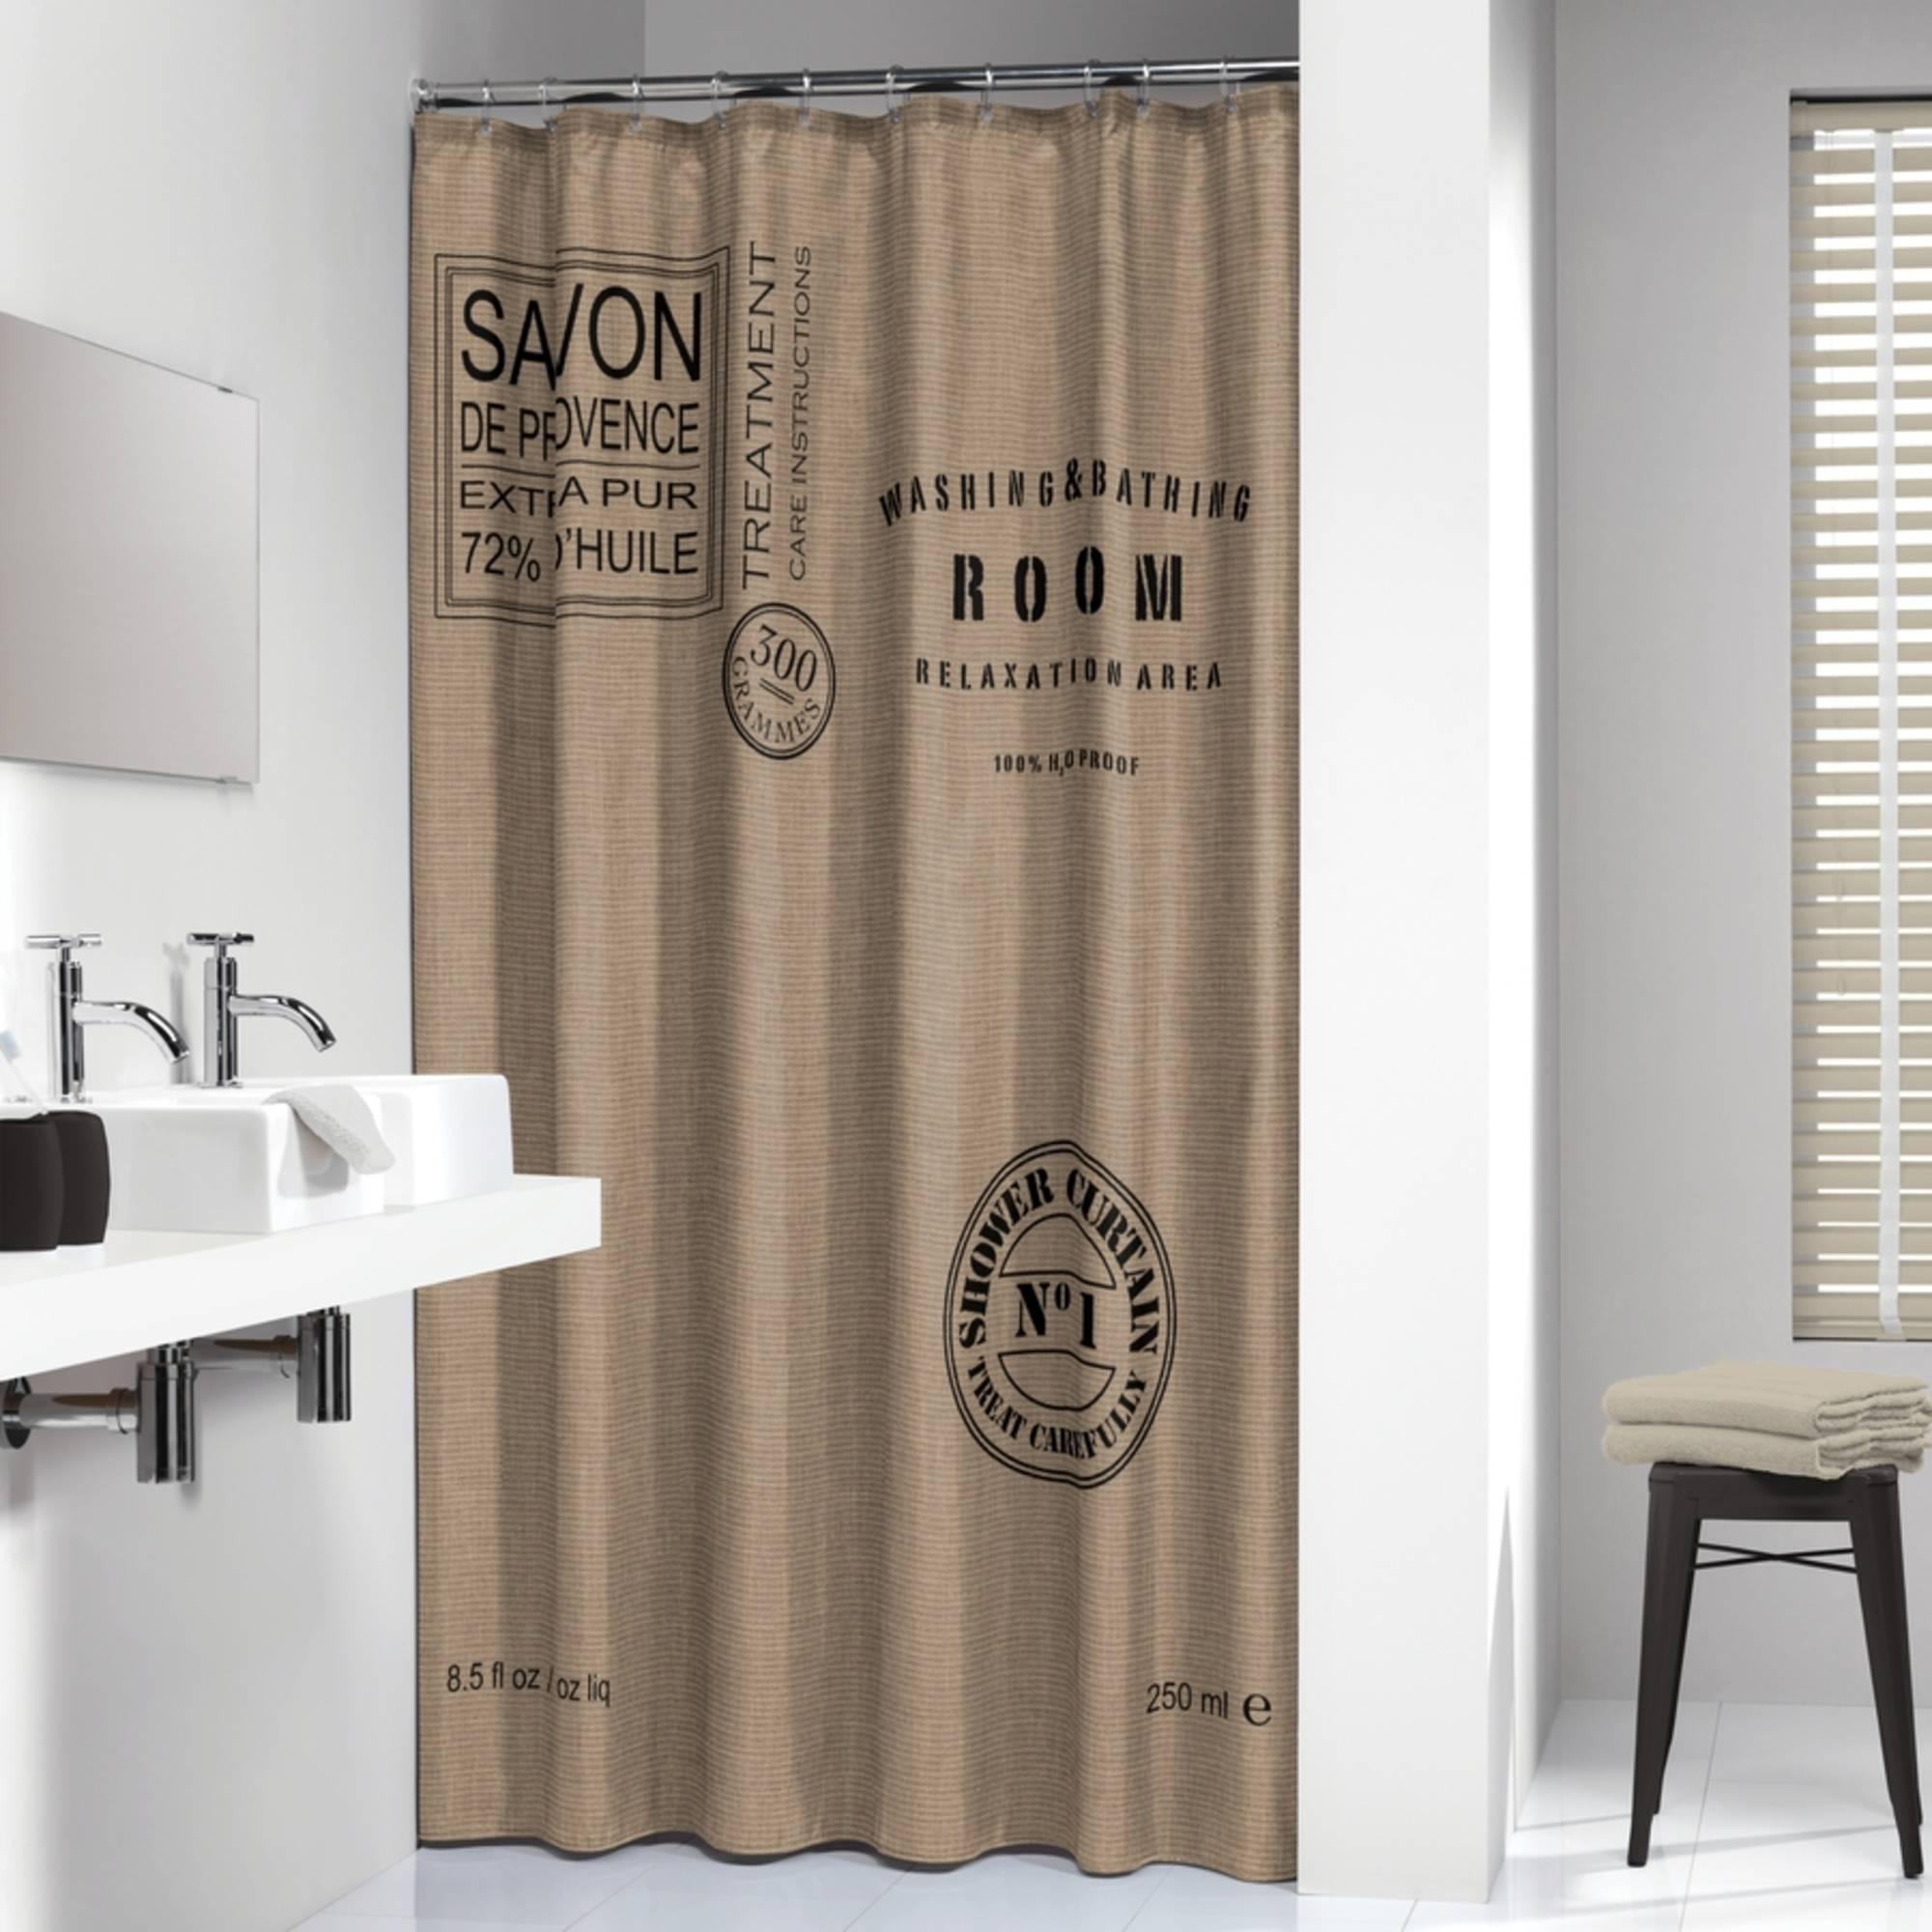 Sealskin Douchegordijn Textiel Savon De Provence 200 x 180cm Linnen